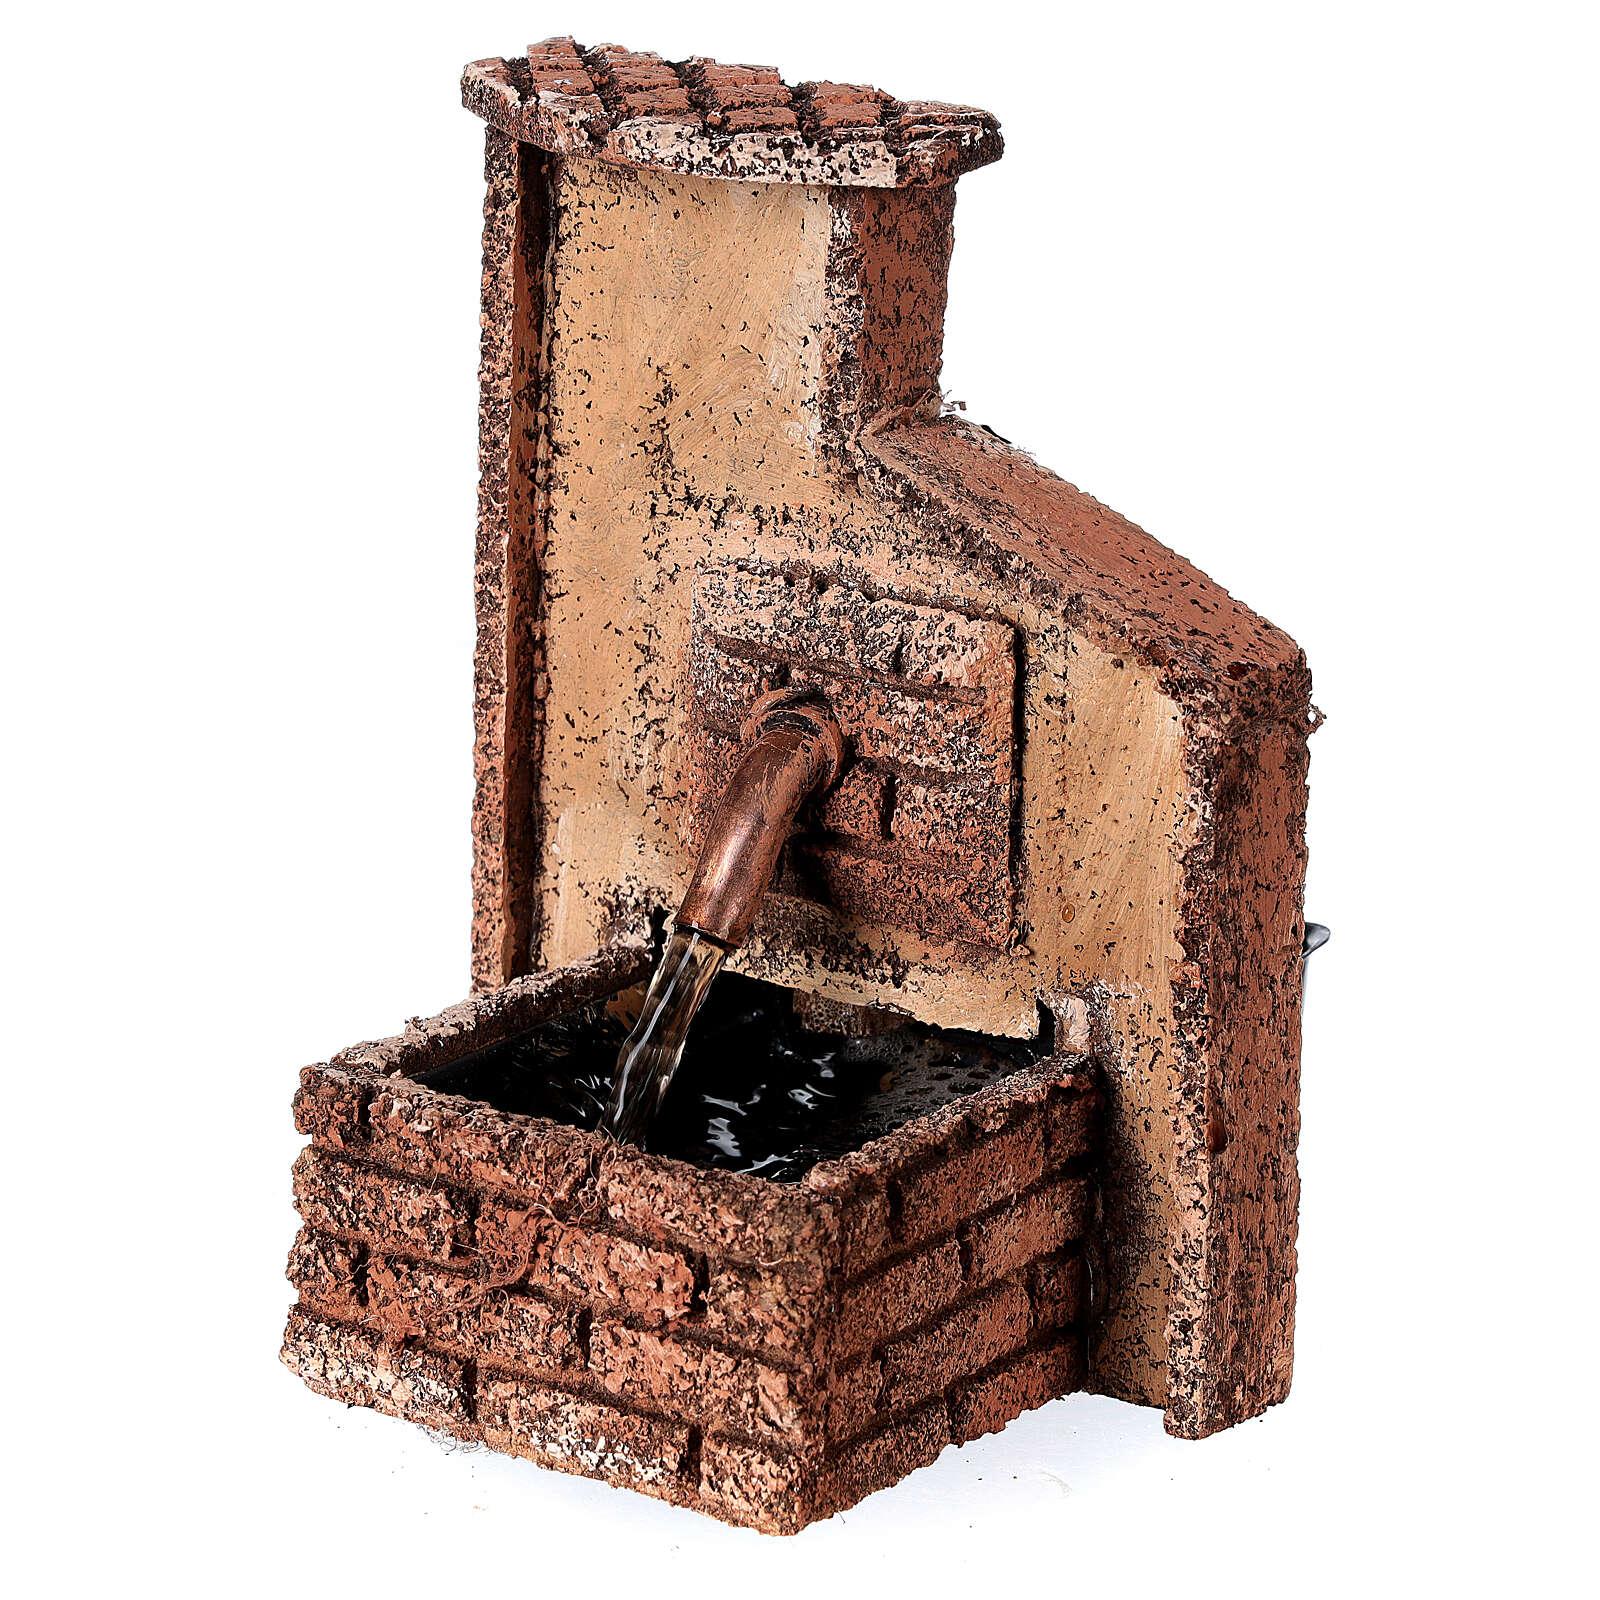 Electric cork fountain Neapolitan Nativity Scene with 10-12 cm figurines 15x10x10 cm 4